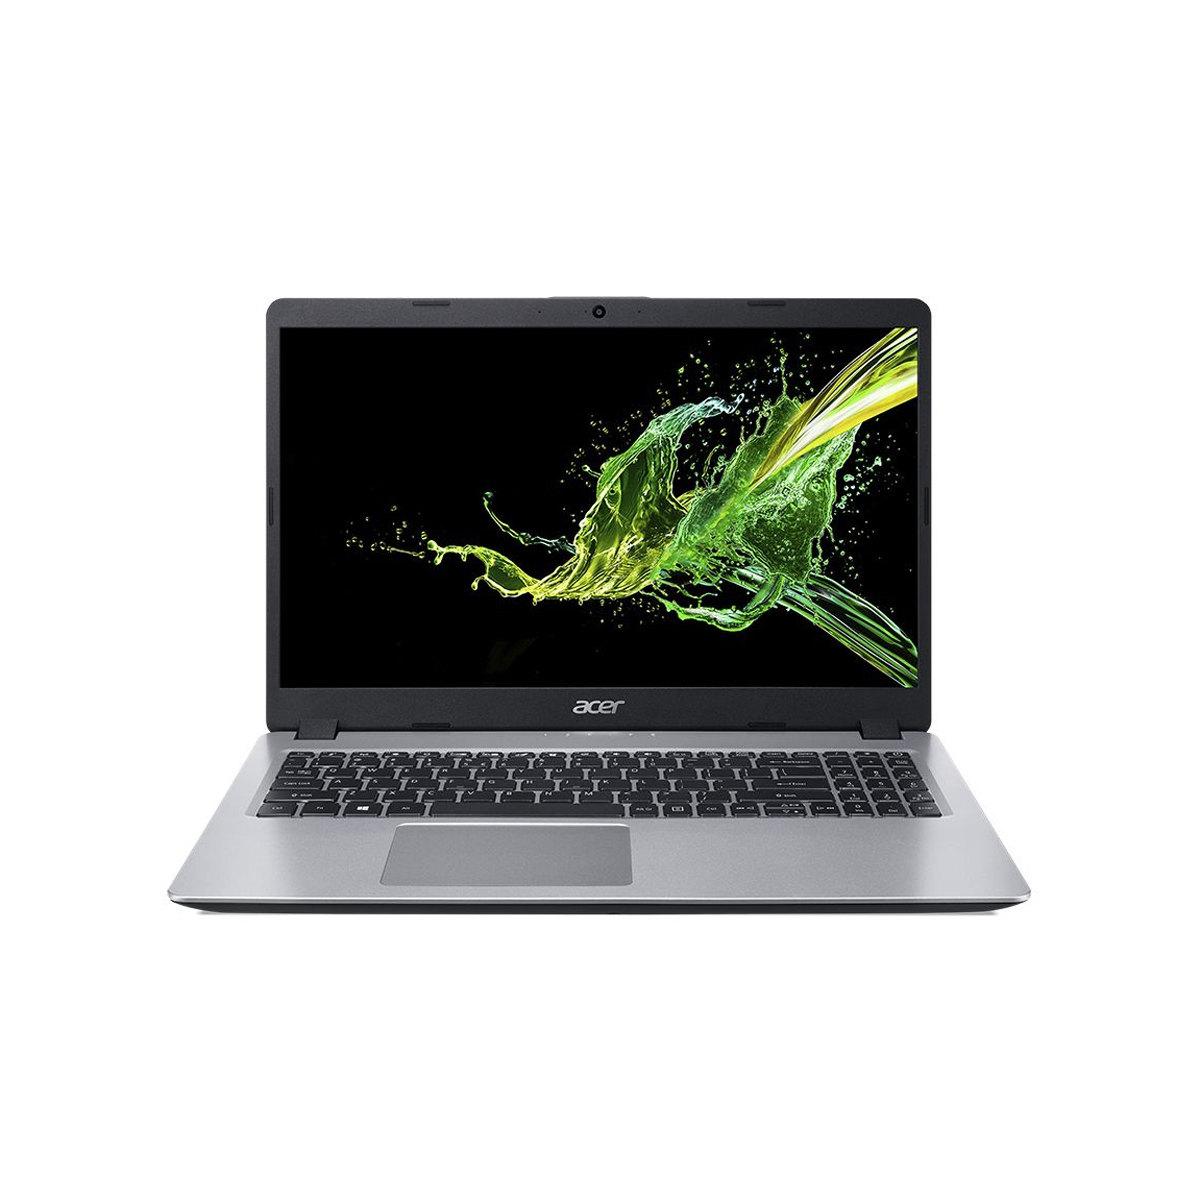 Notebook Acer A515 Core I5 8265u Memoria 8gb Ddr4 Hd 1tb Ssd 480gb Tela 15.6' Led Hd Sistema Windows 10 Home